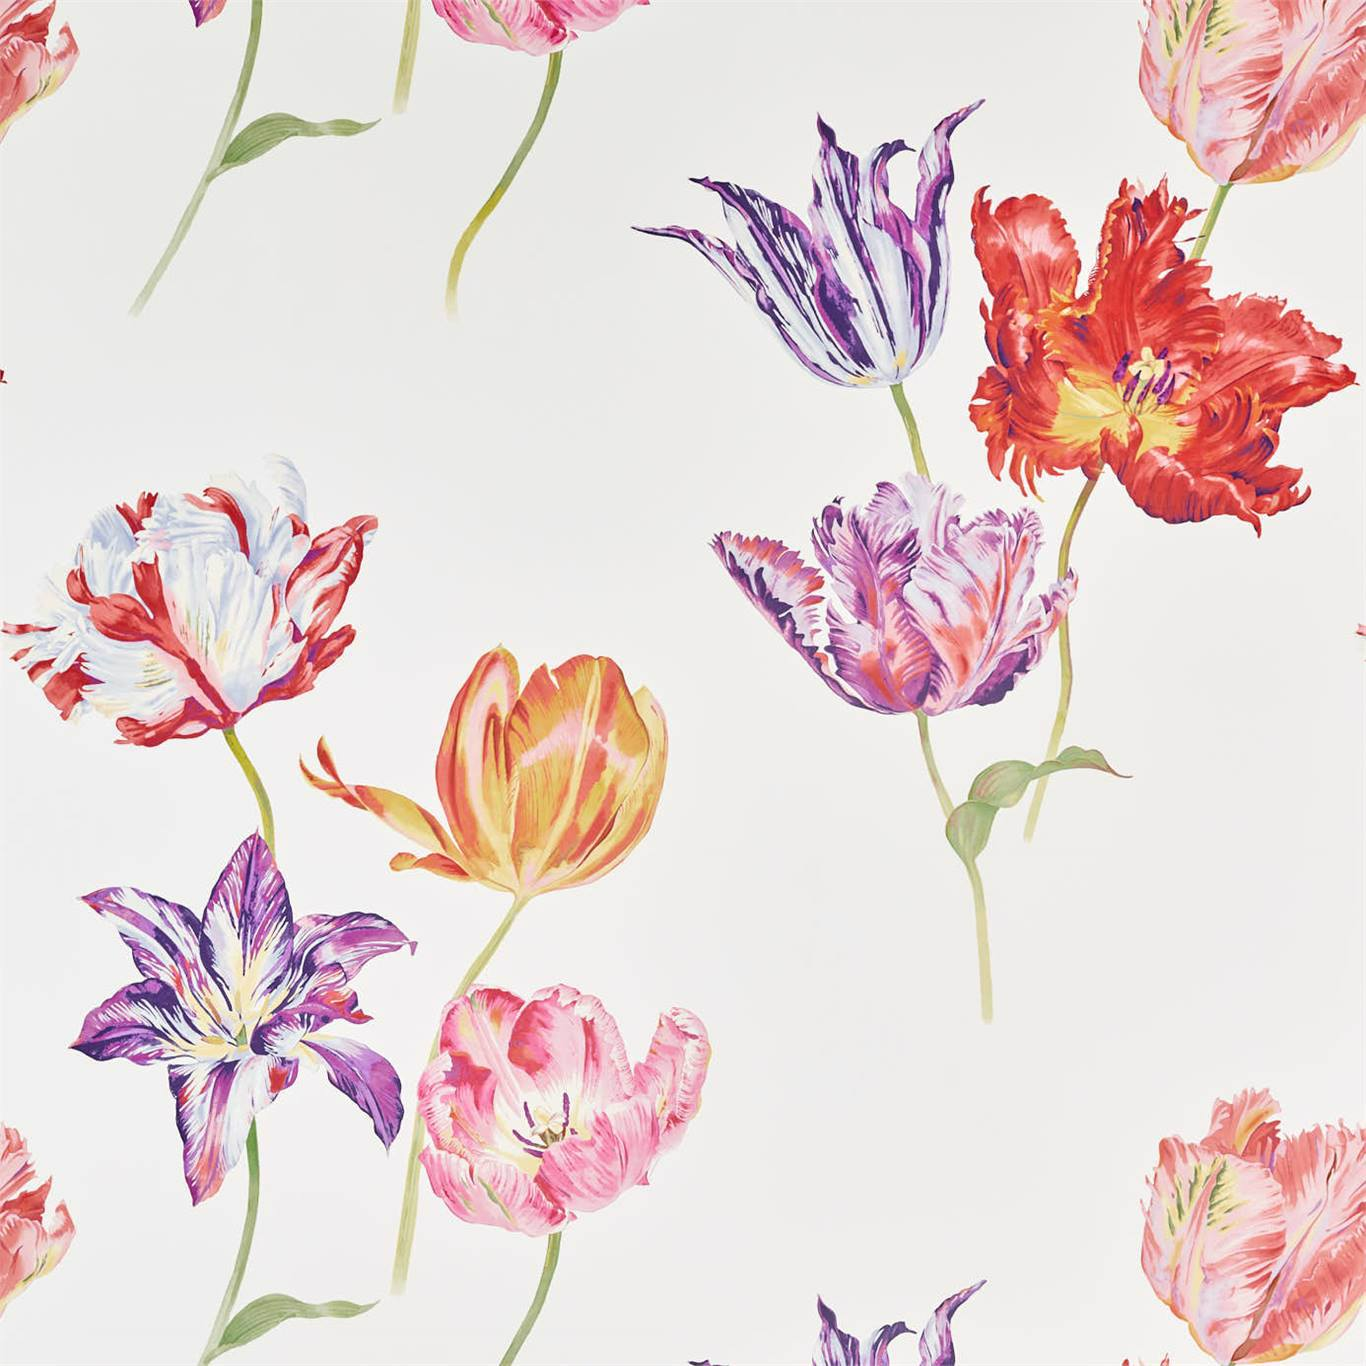 Tulipomania by SAN